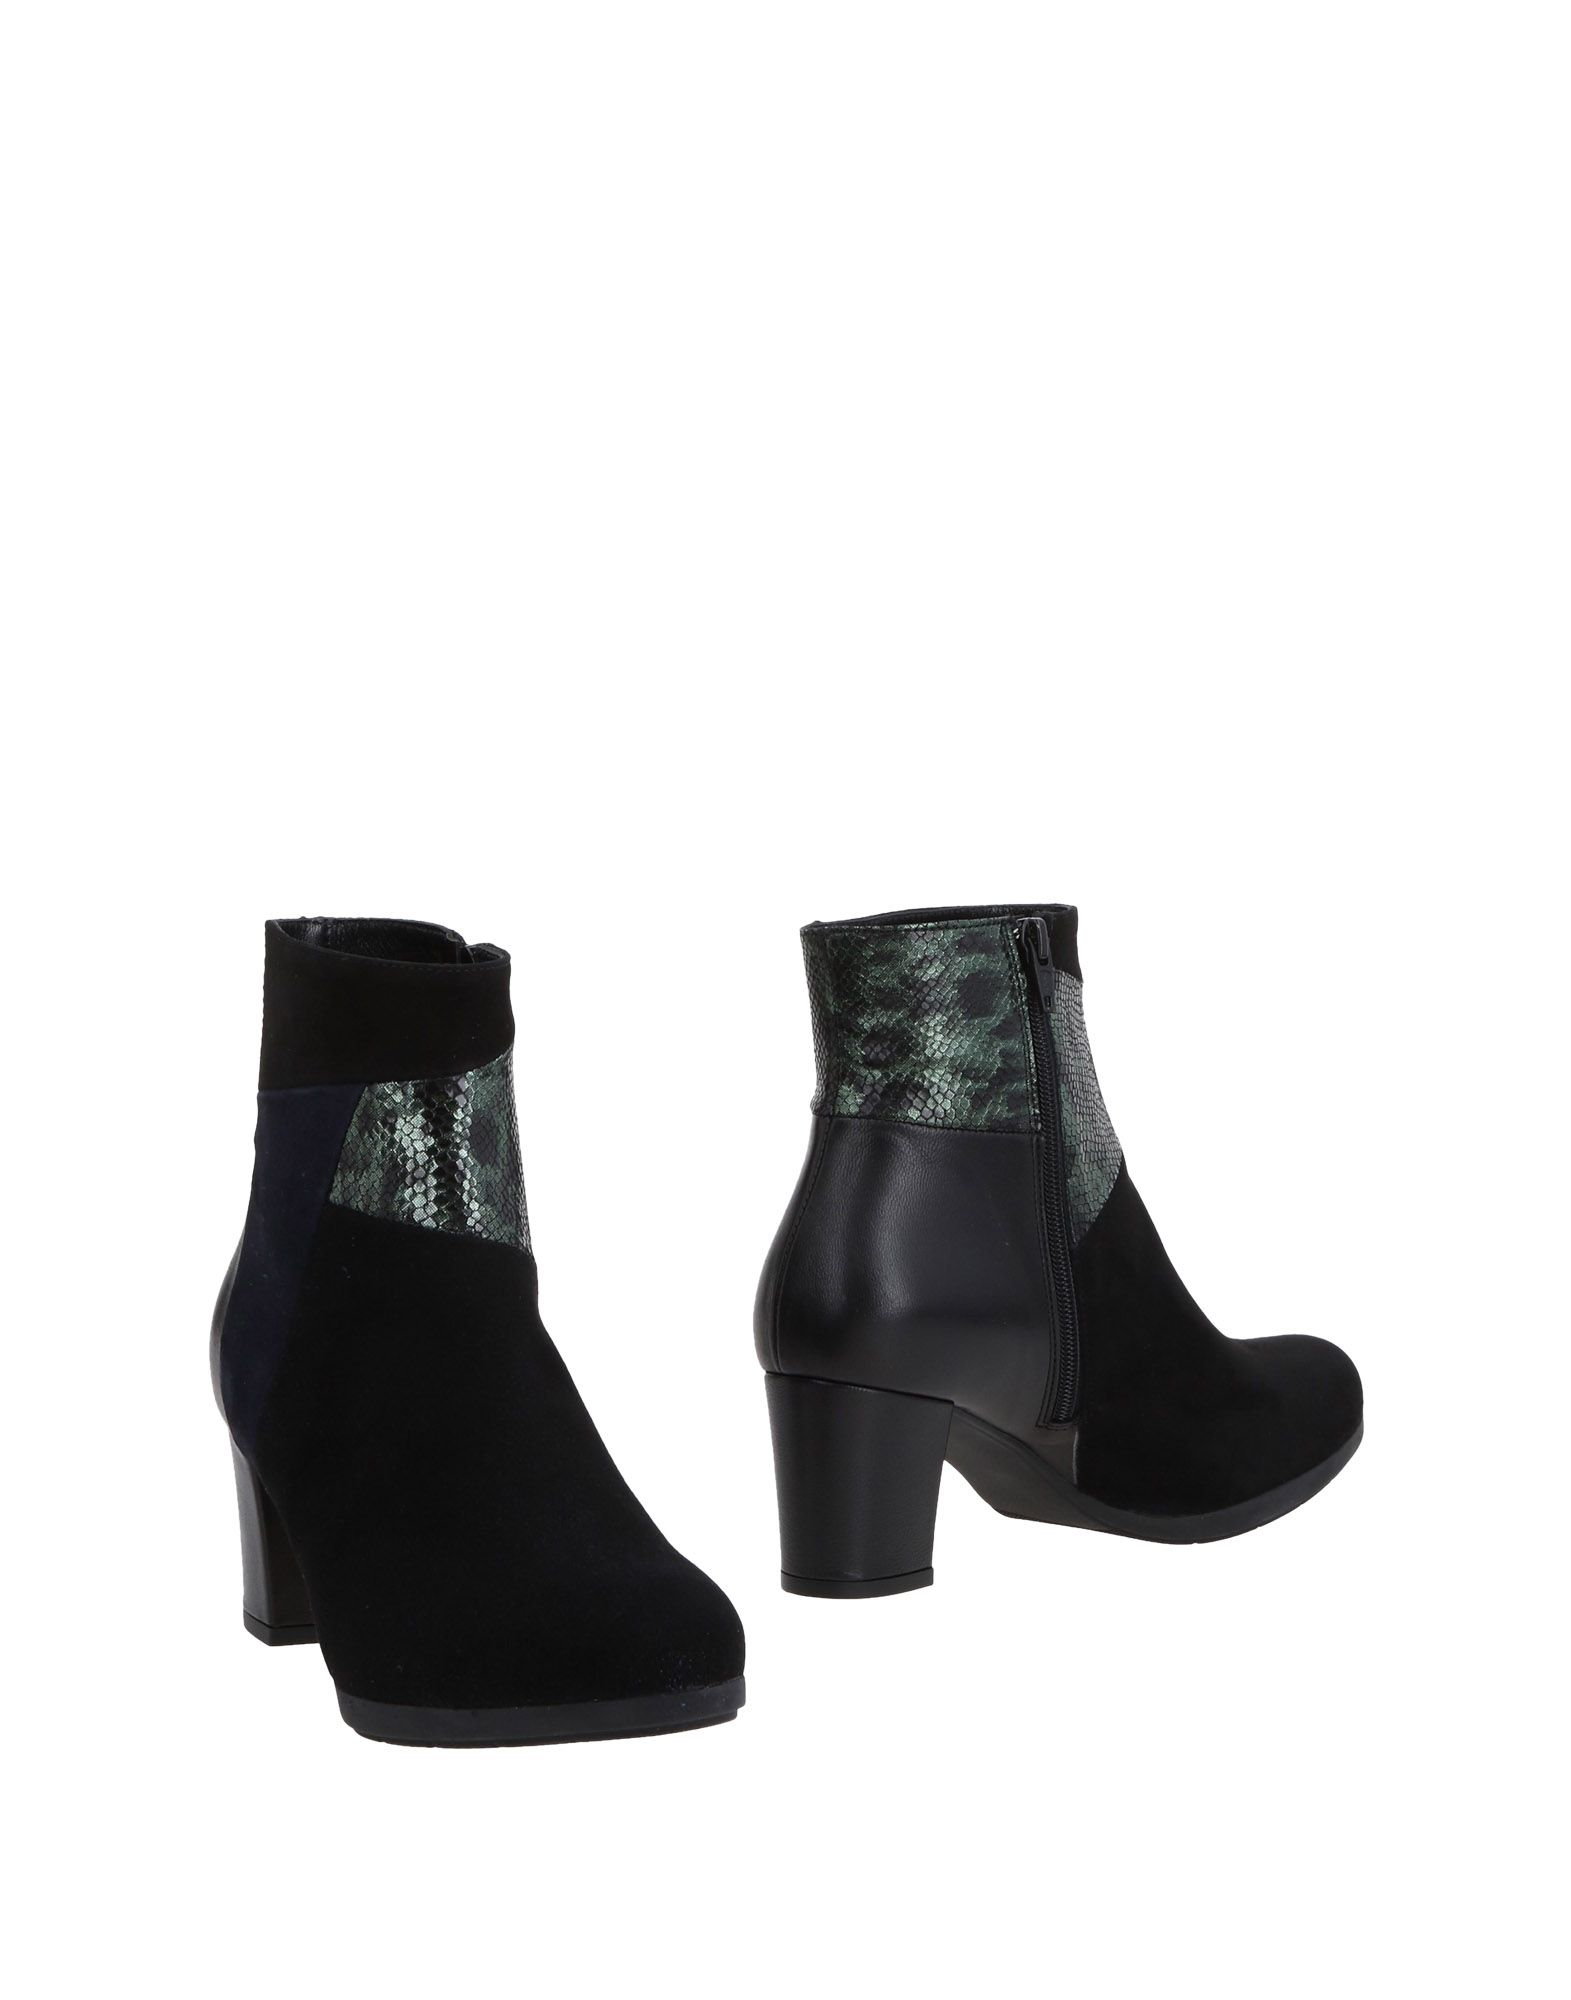 Donna Soft Ankle Boot - Women Donna Soft Ankle Australia Boots online on  Australia Ankle - 11487107GH e07e8f